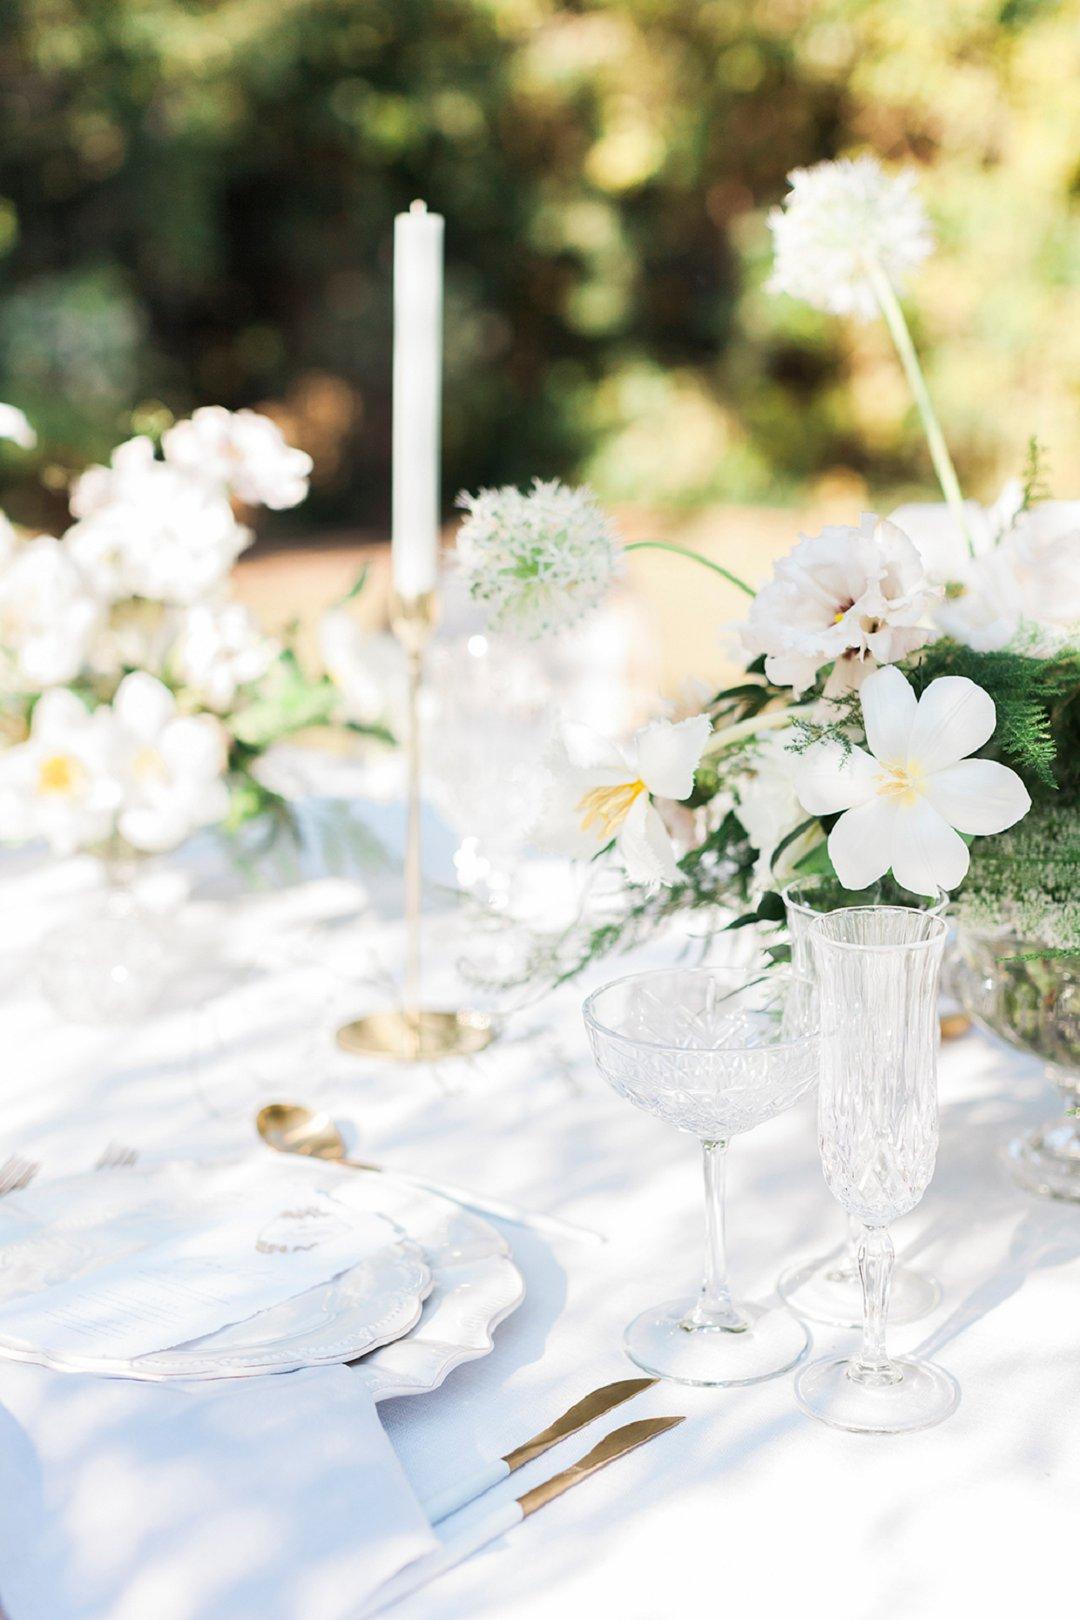 Elegant Intimate Outdoor Wedding Inspiration